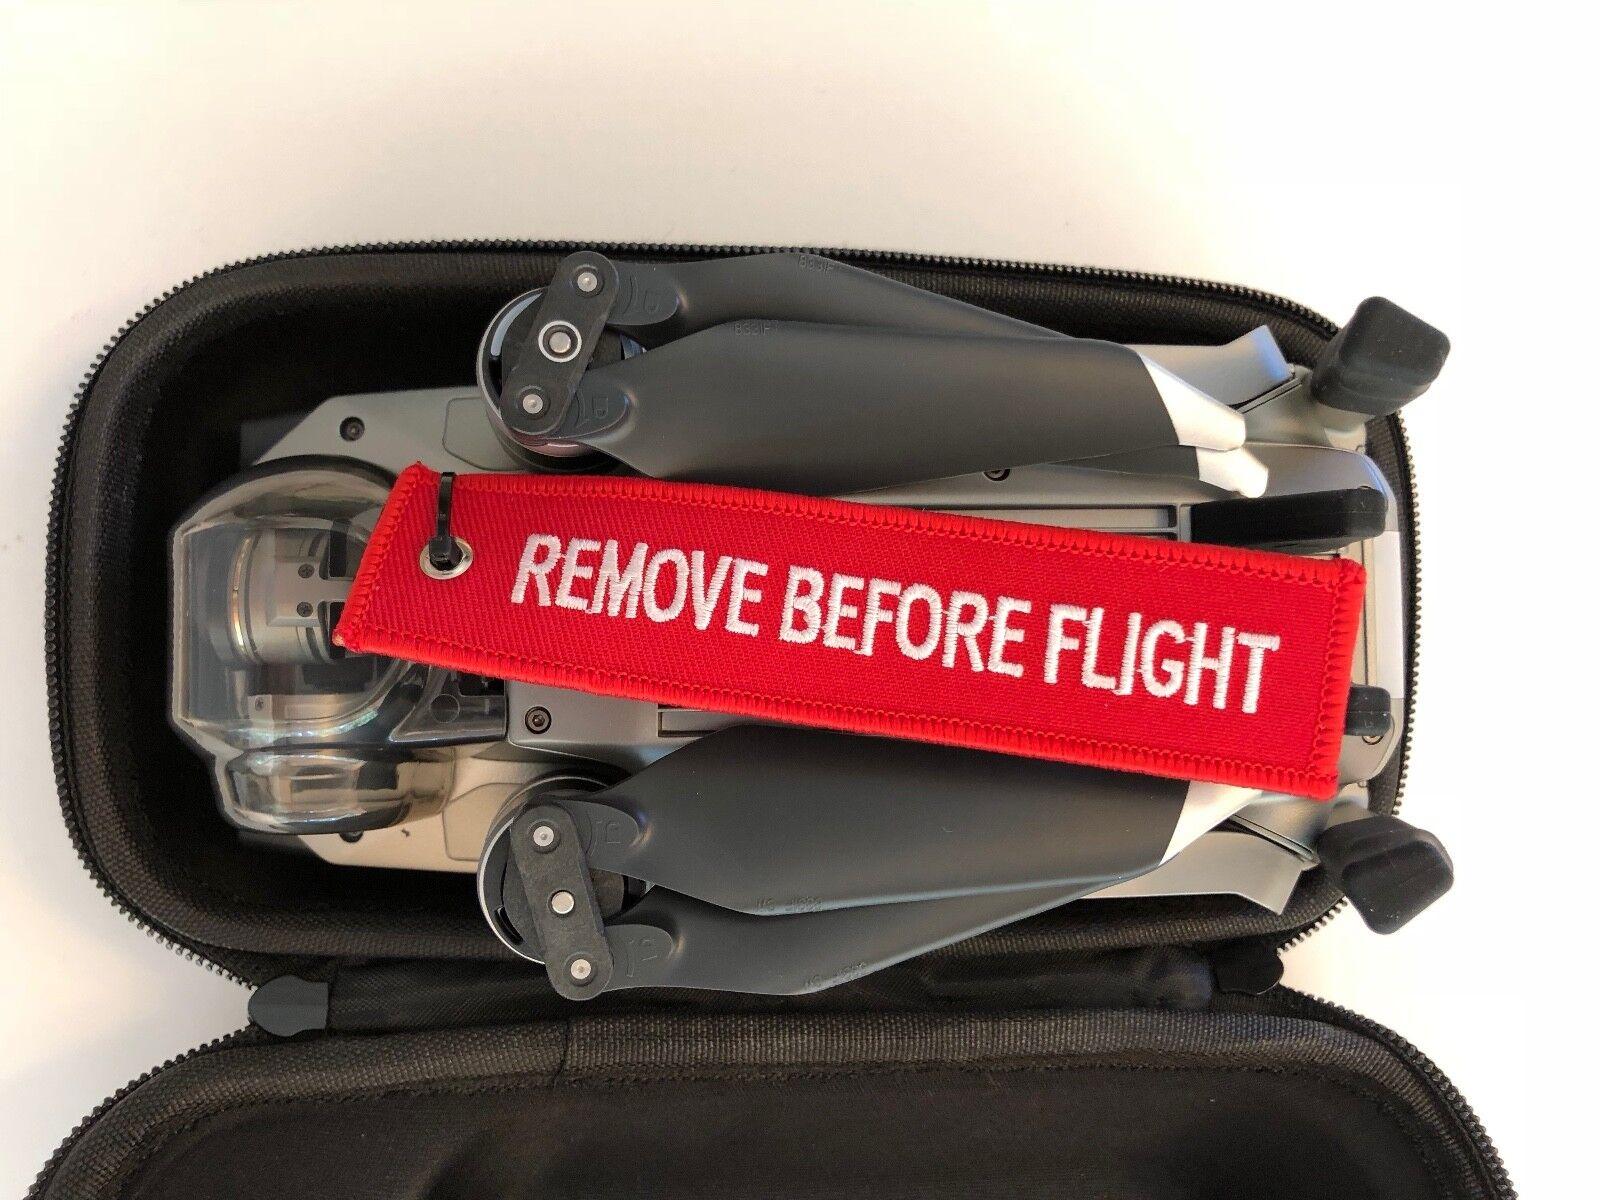 DJI Mavic 2 Pro / Zoom ..Gimbal Saver.... Remove Before Flight... Warning Ribbon